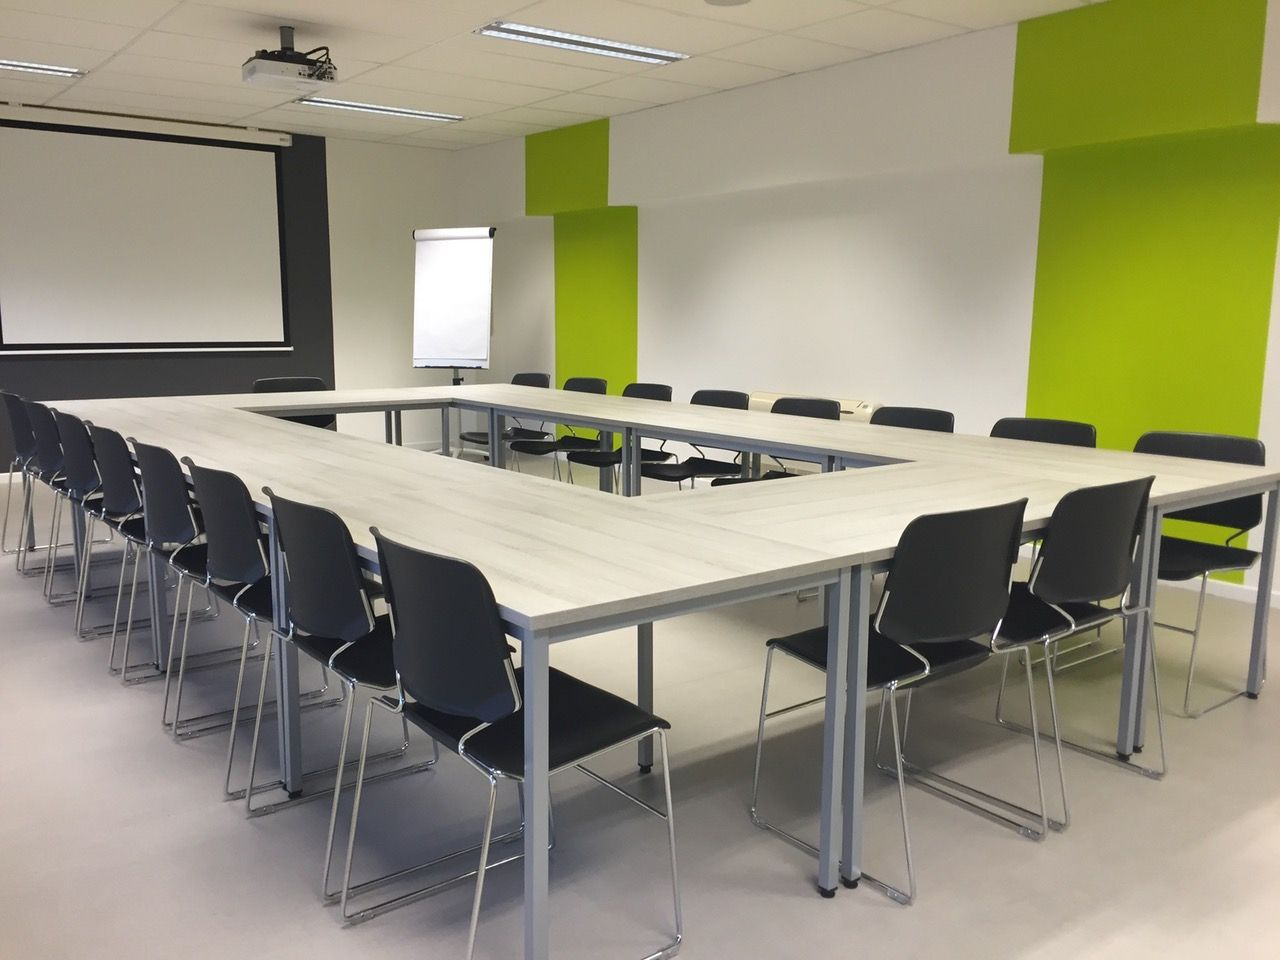 meeting-modern-room-conference-159805-compressor.jpeg